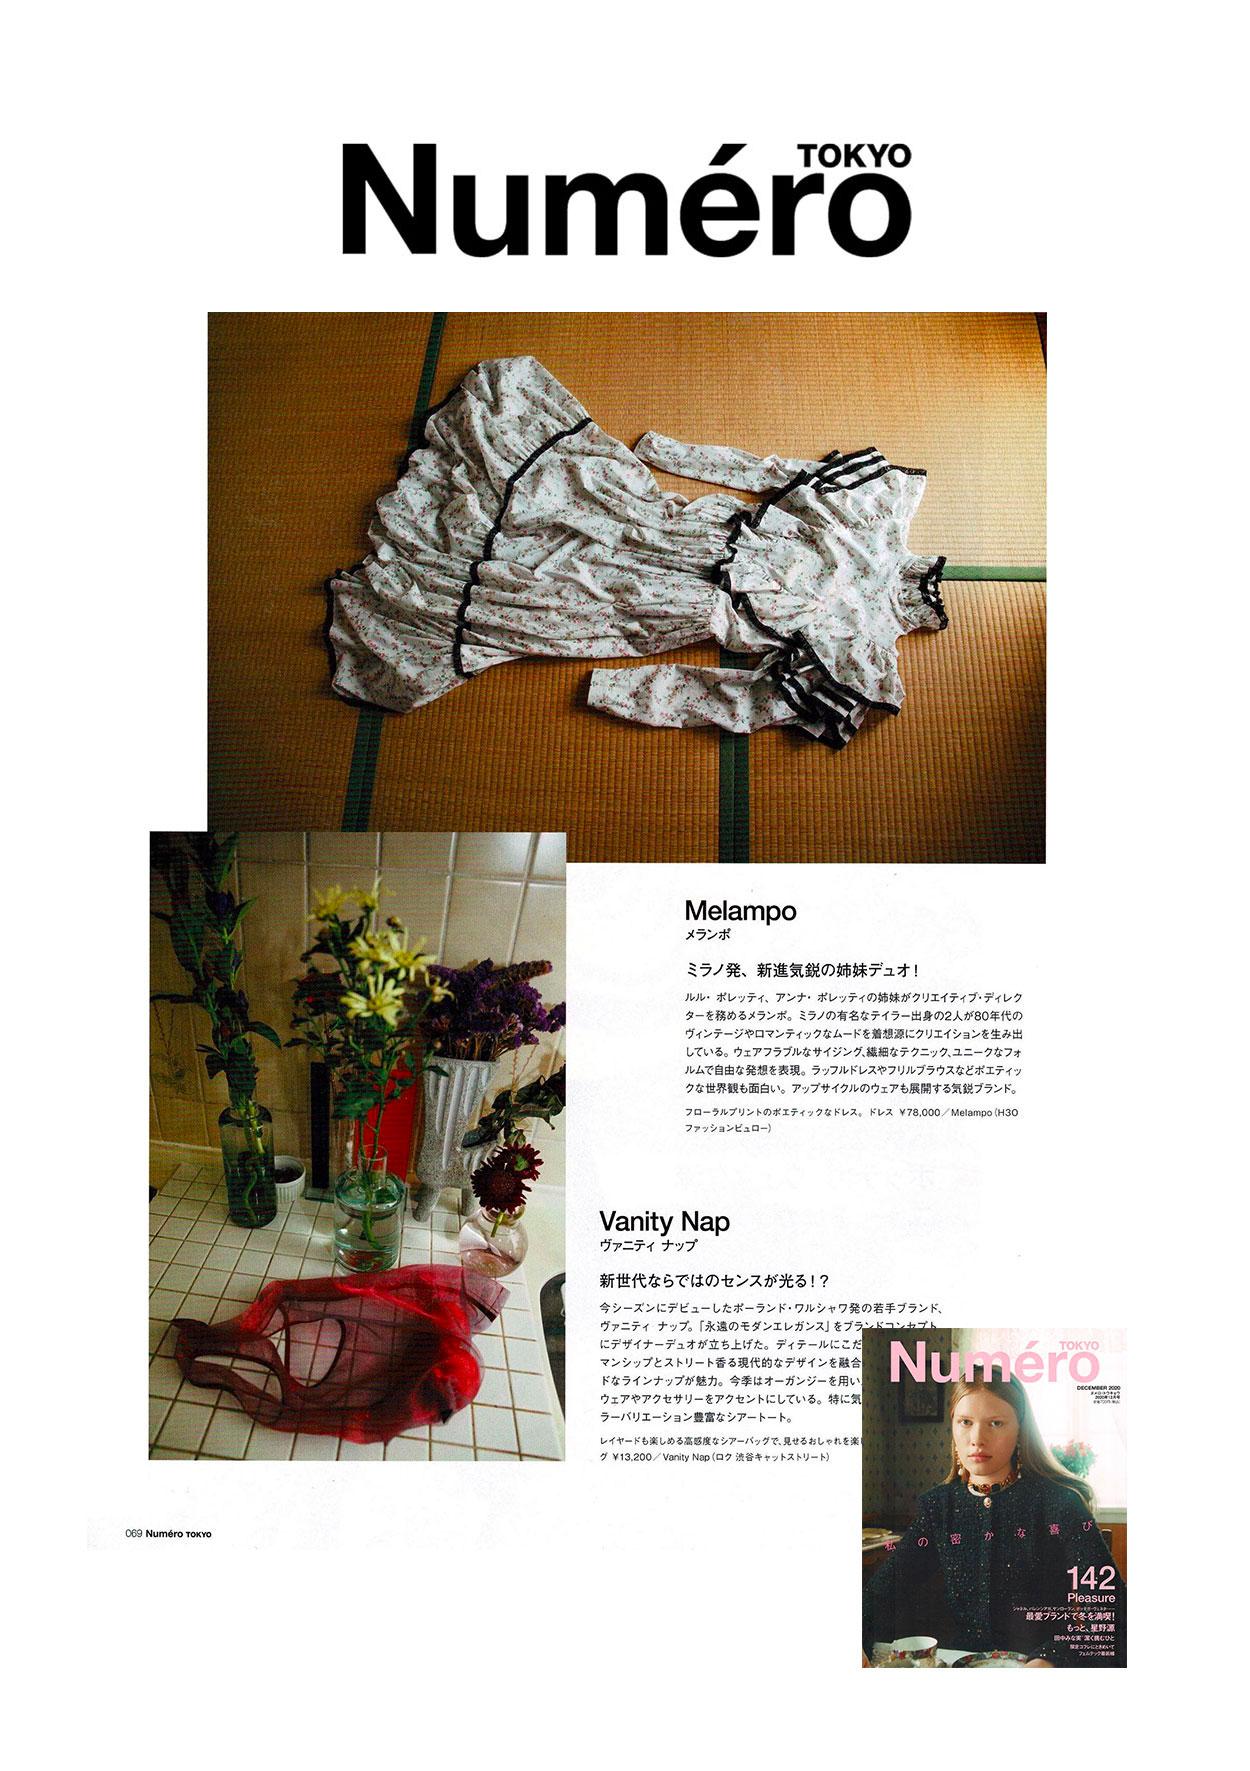 melampo-press-numero-tokyo-magazine.jpg